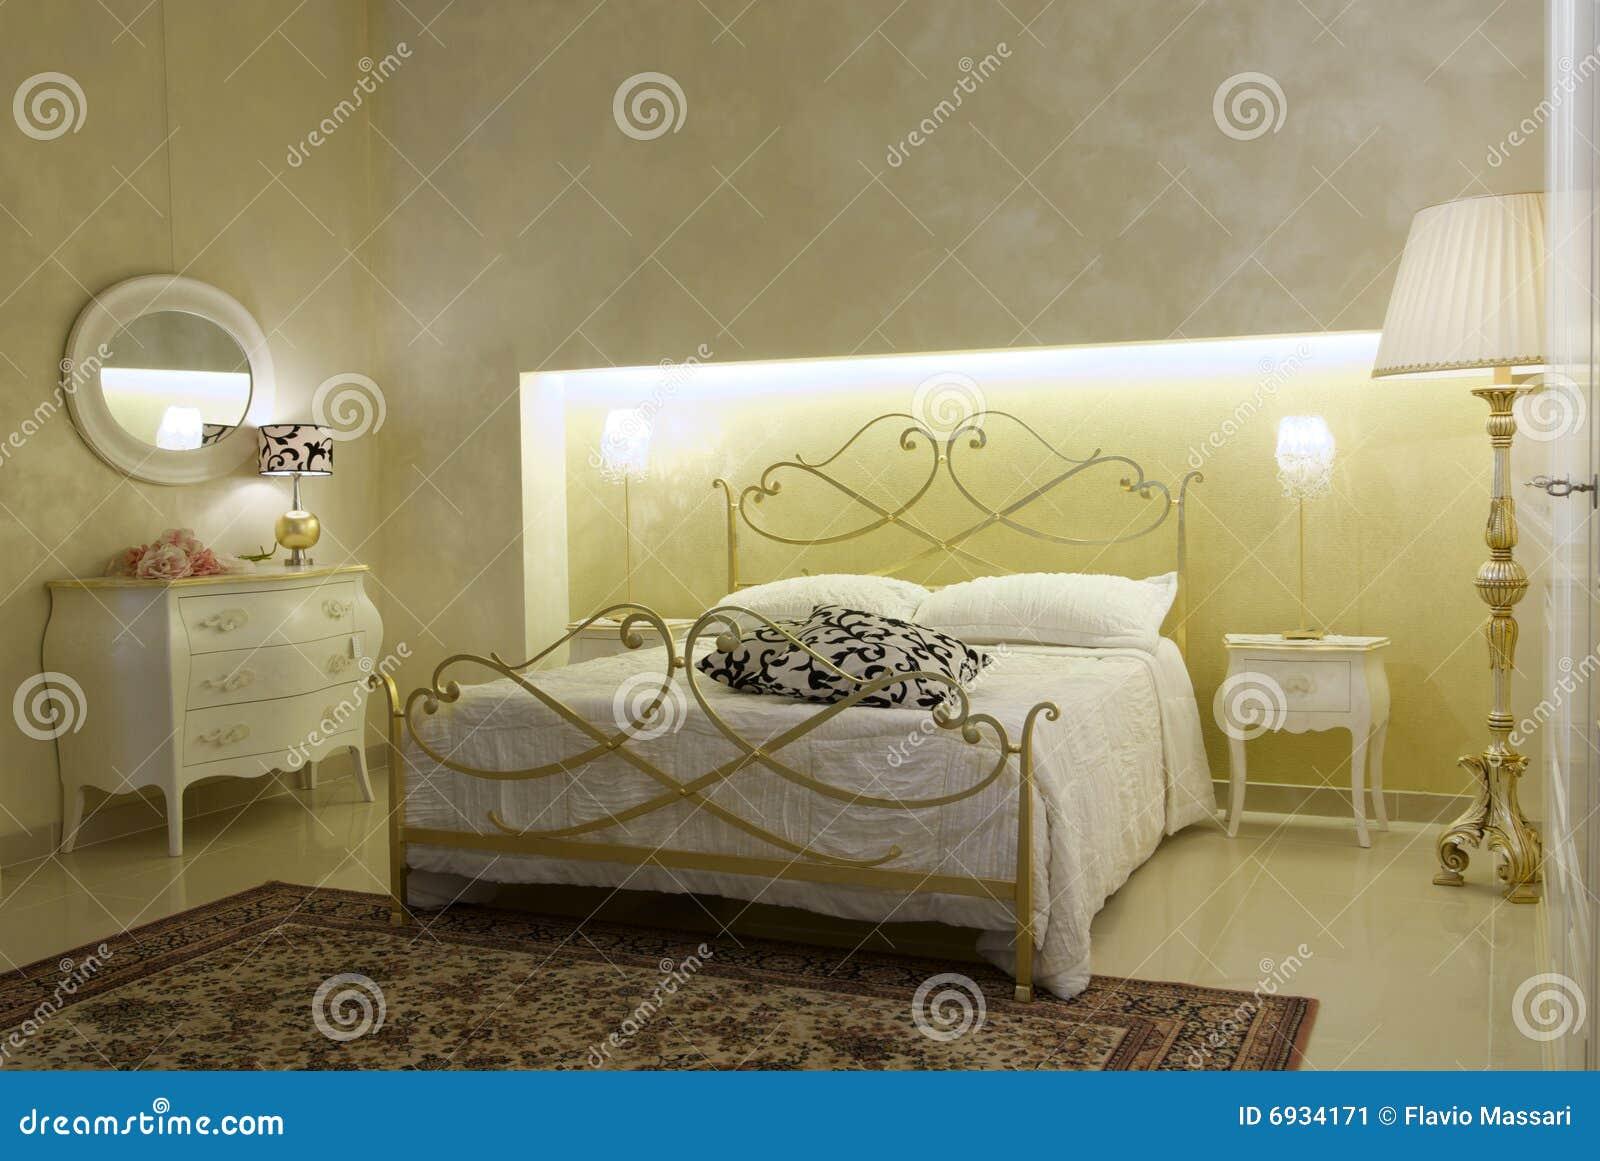 Warme Slaapkamer Koelen : Warme klassieke slaapkamer stock afbeelding. afbeelding bestaande